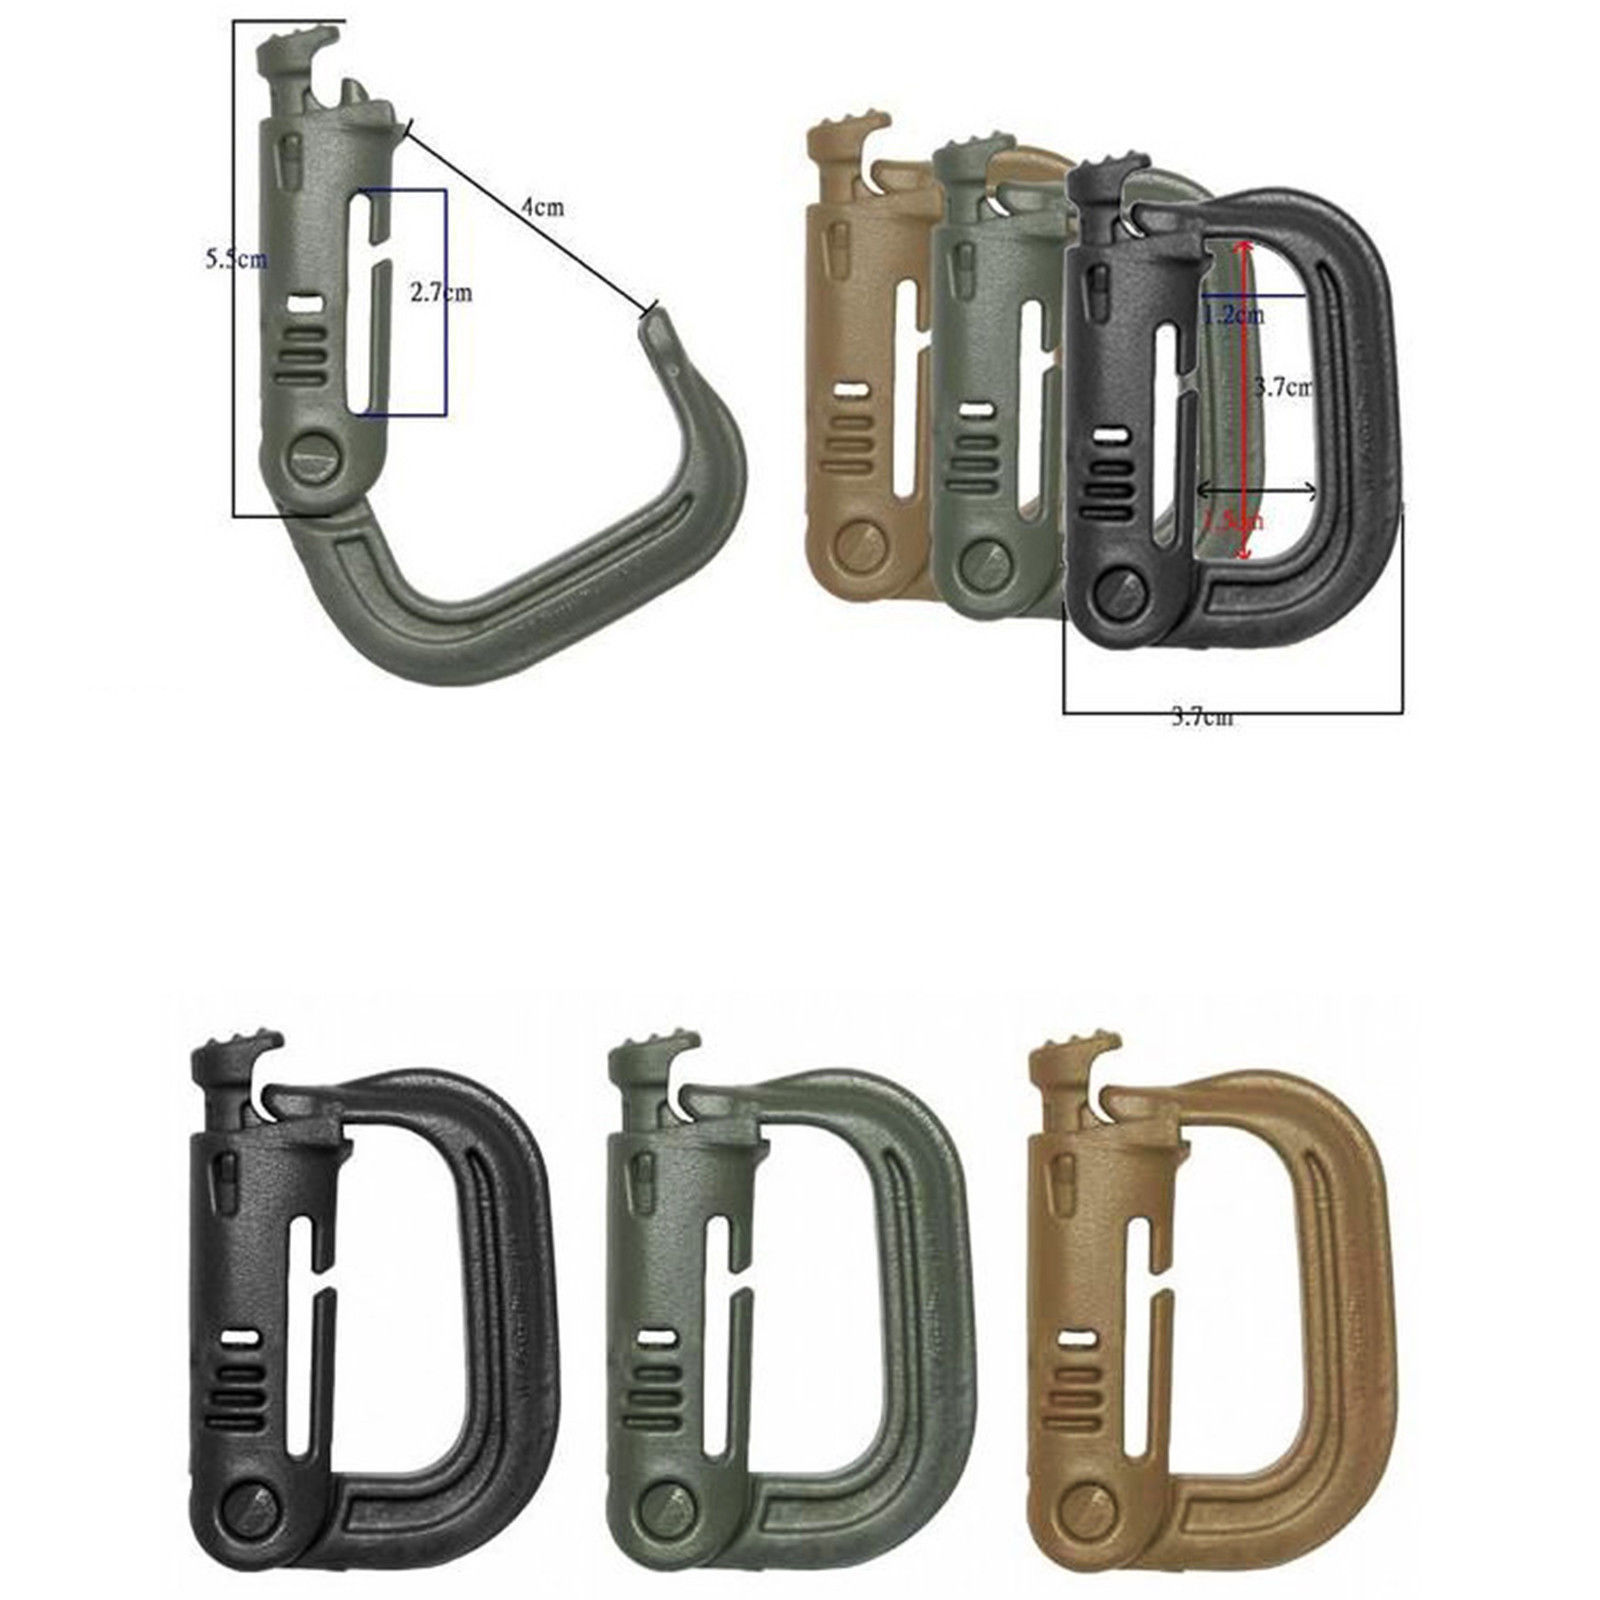 10 Pcs/lot Grimloc D Shape Carabiner Buckle Webbing Belt/strap Bergen Rucksack ITW Ghillie